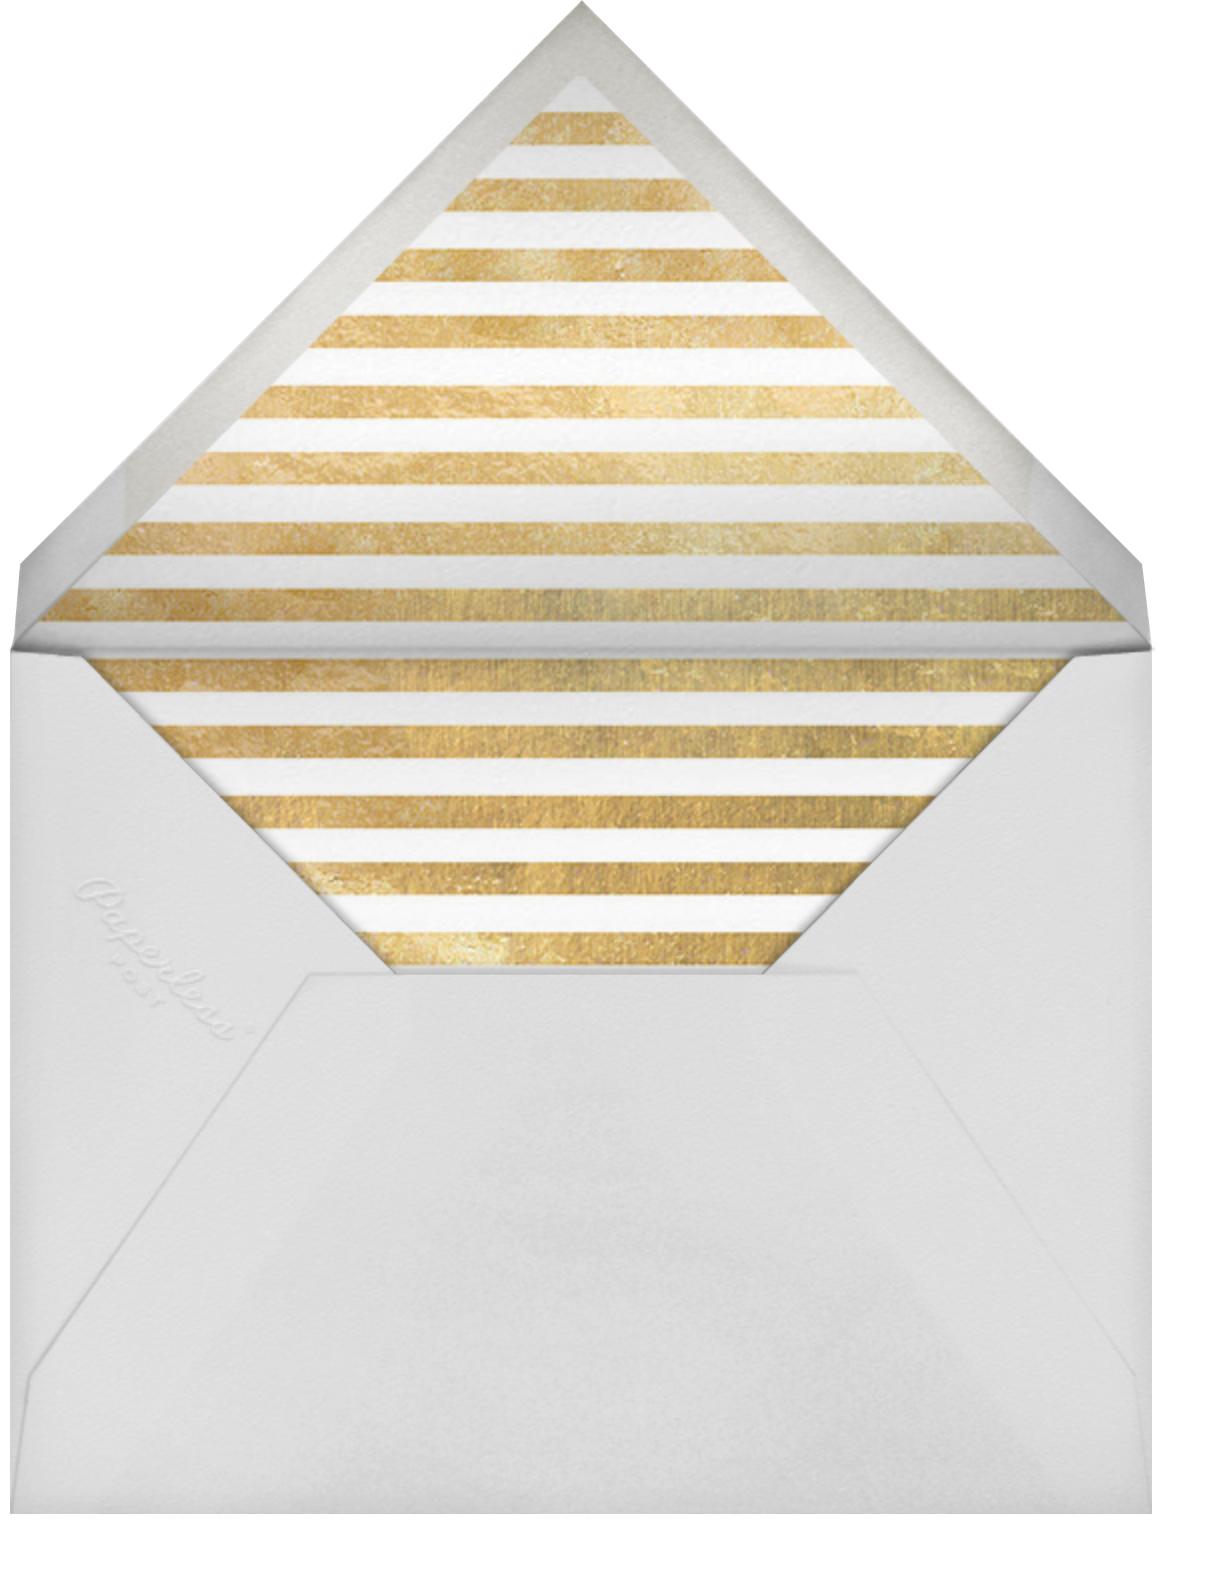 Champagne Bubbles - Paperless Post - Graduation party - envelope back